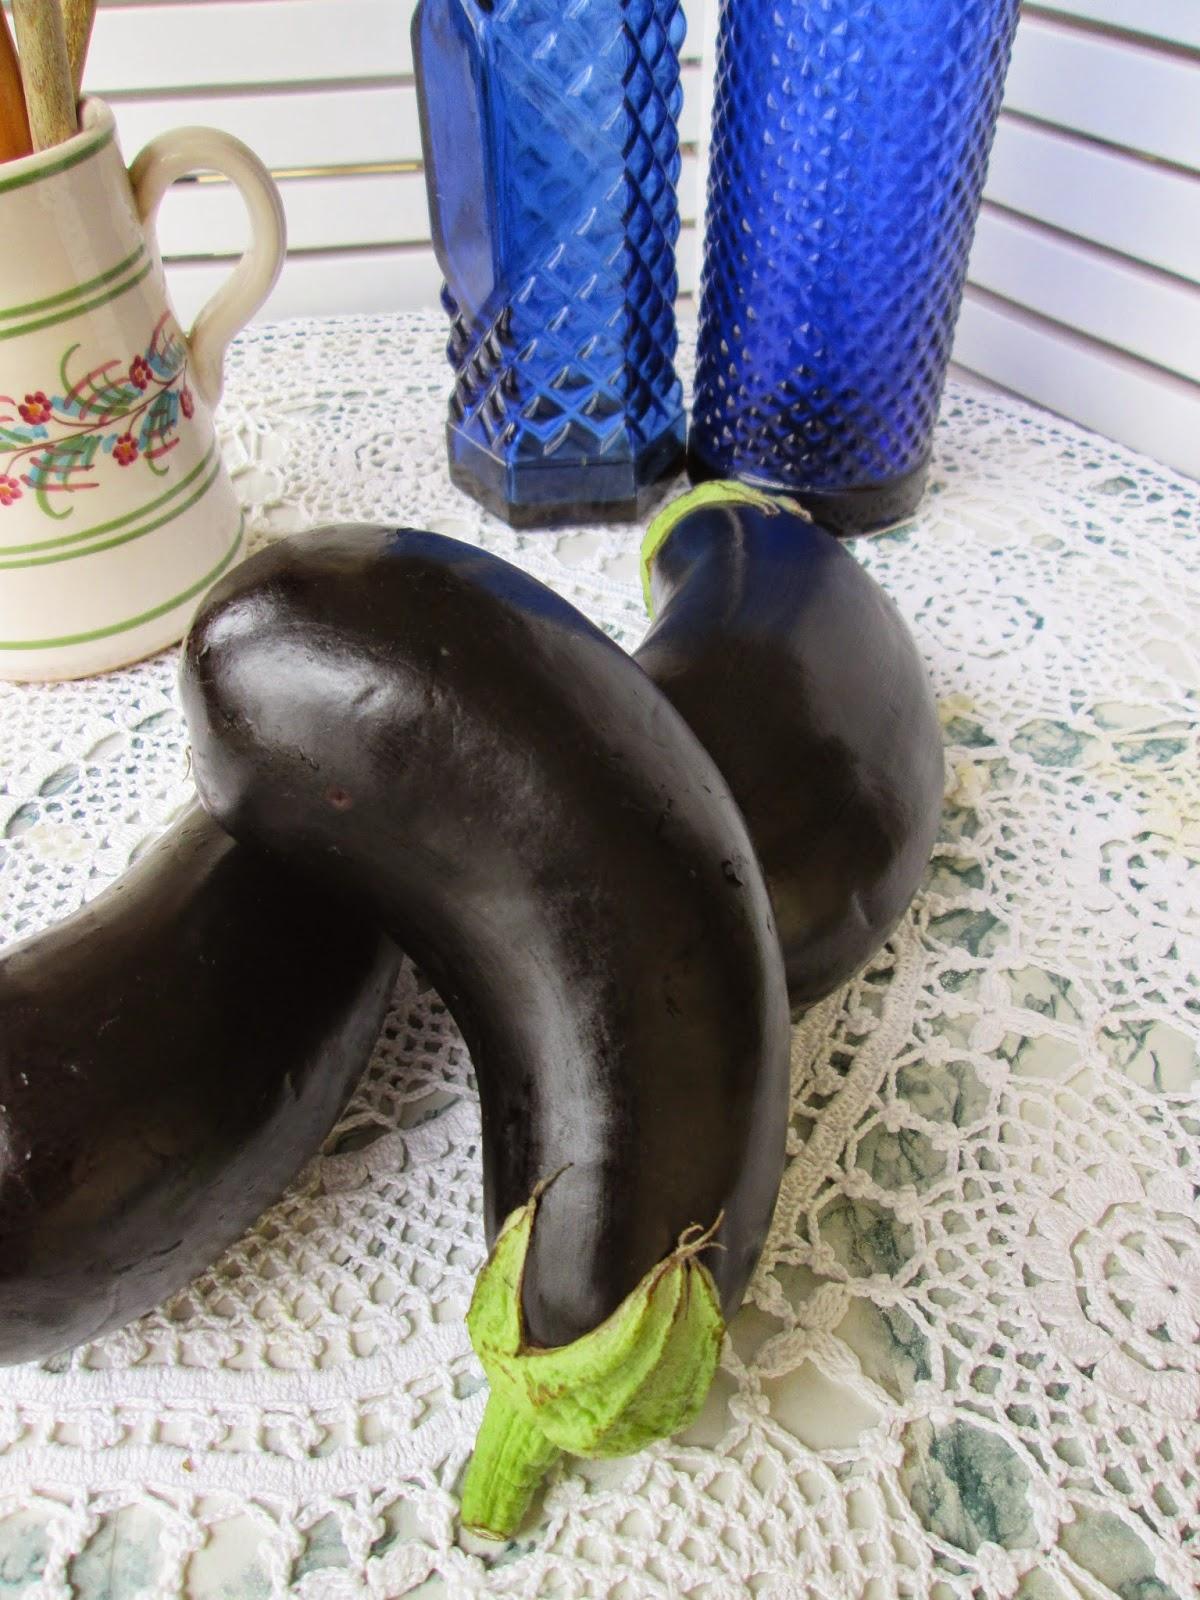 Berinjela com mussarela (melanzane con mozzarella)